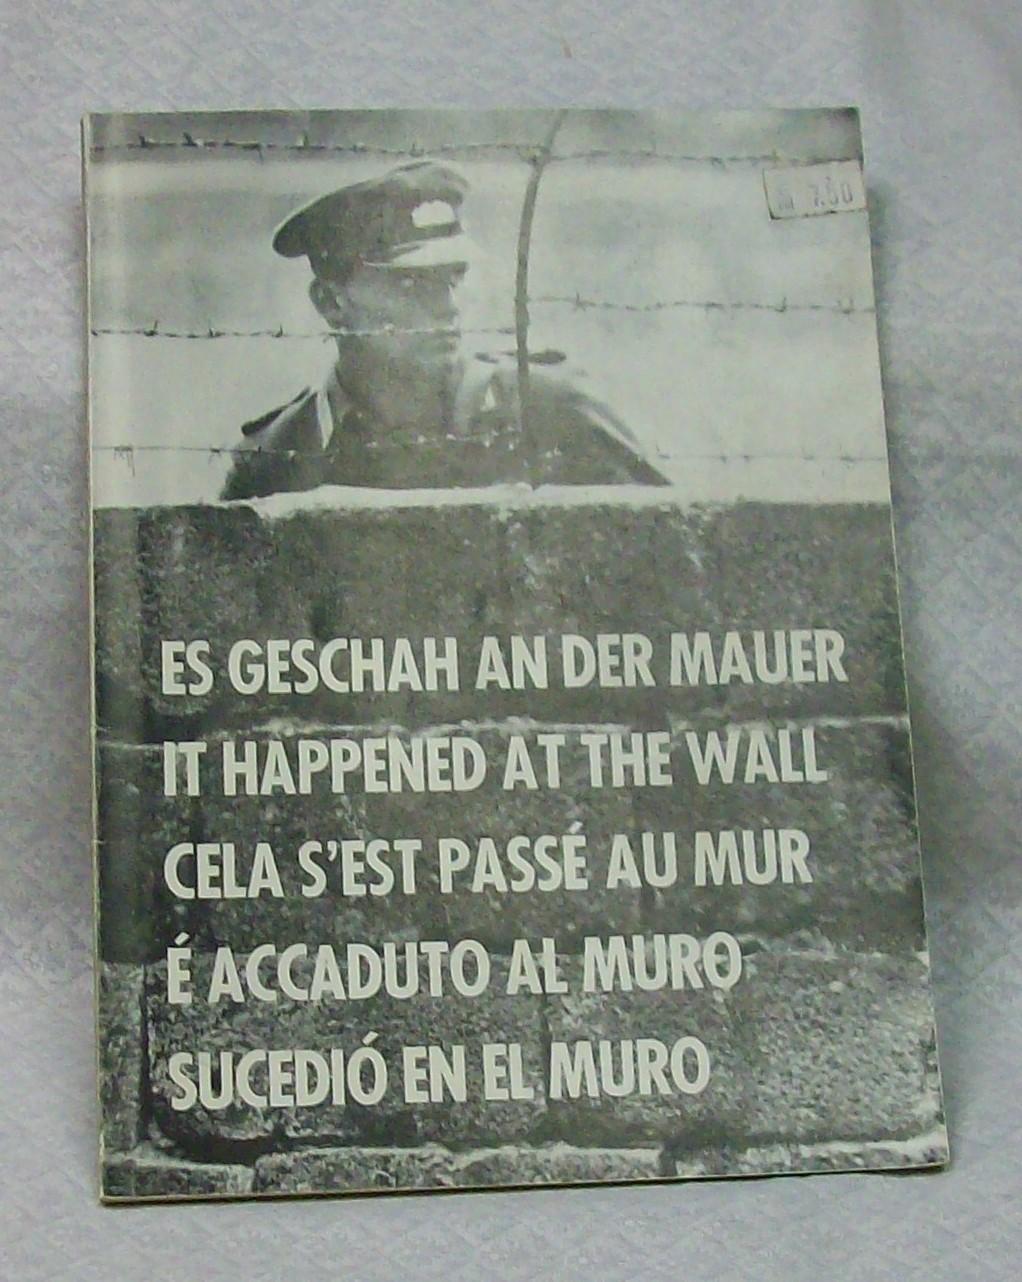 It Happened at the Wall Berlin Wall